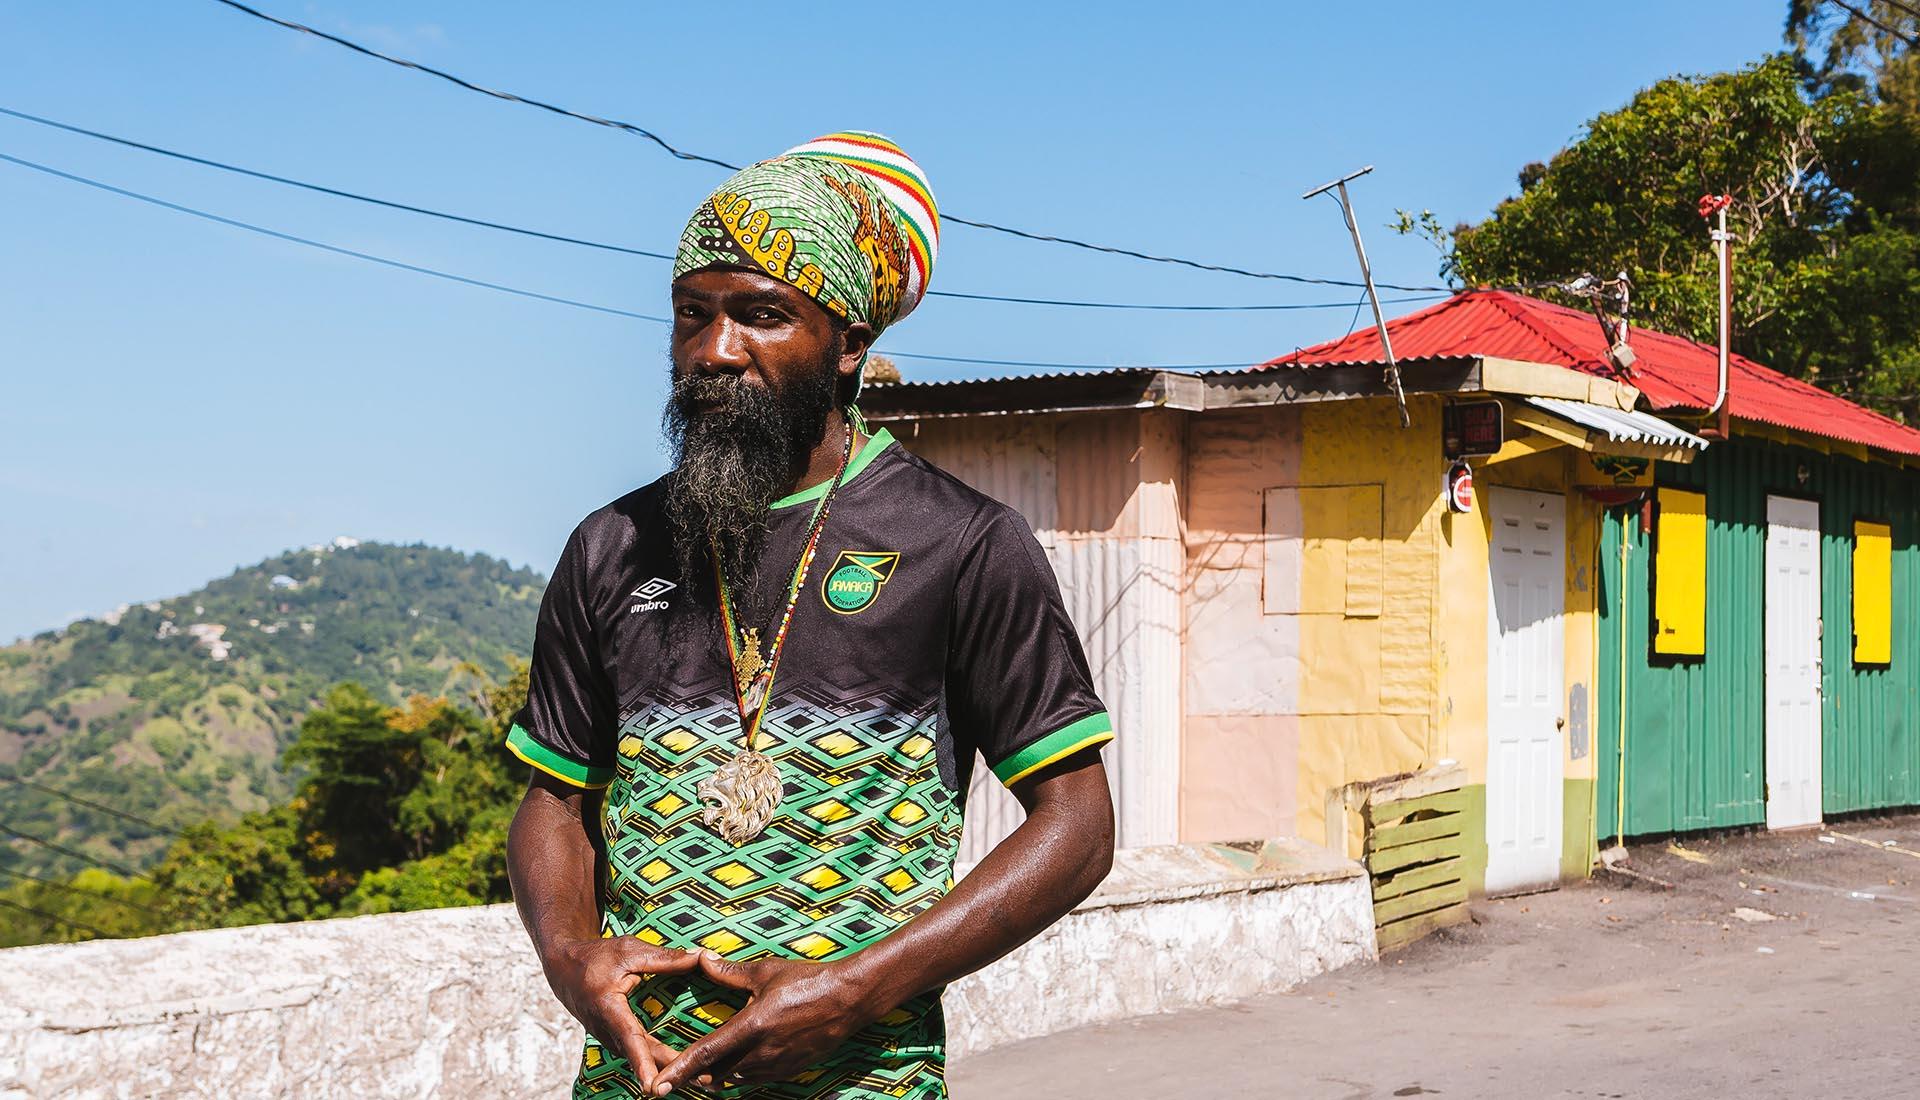 jamaica-umbro-kits_0003_s-selects-9